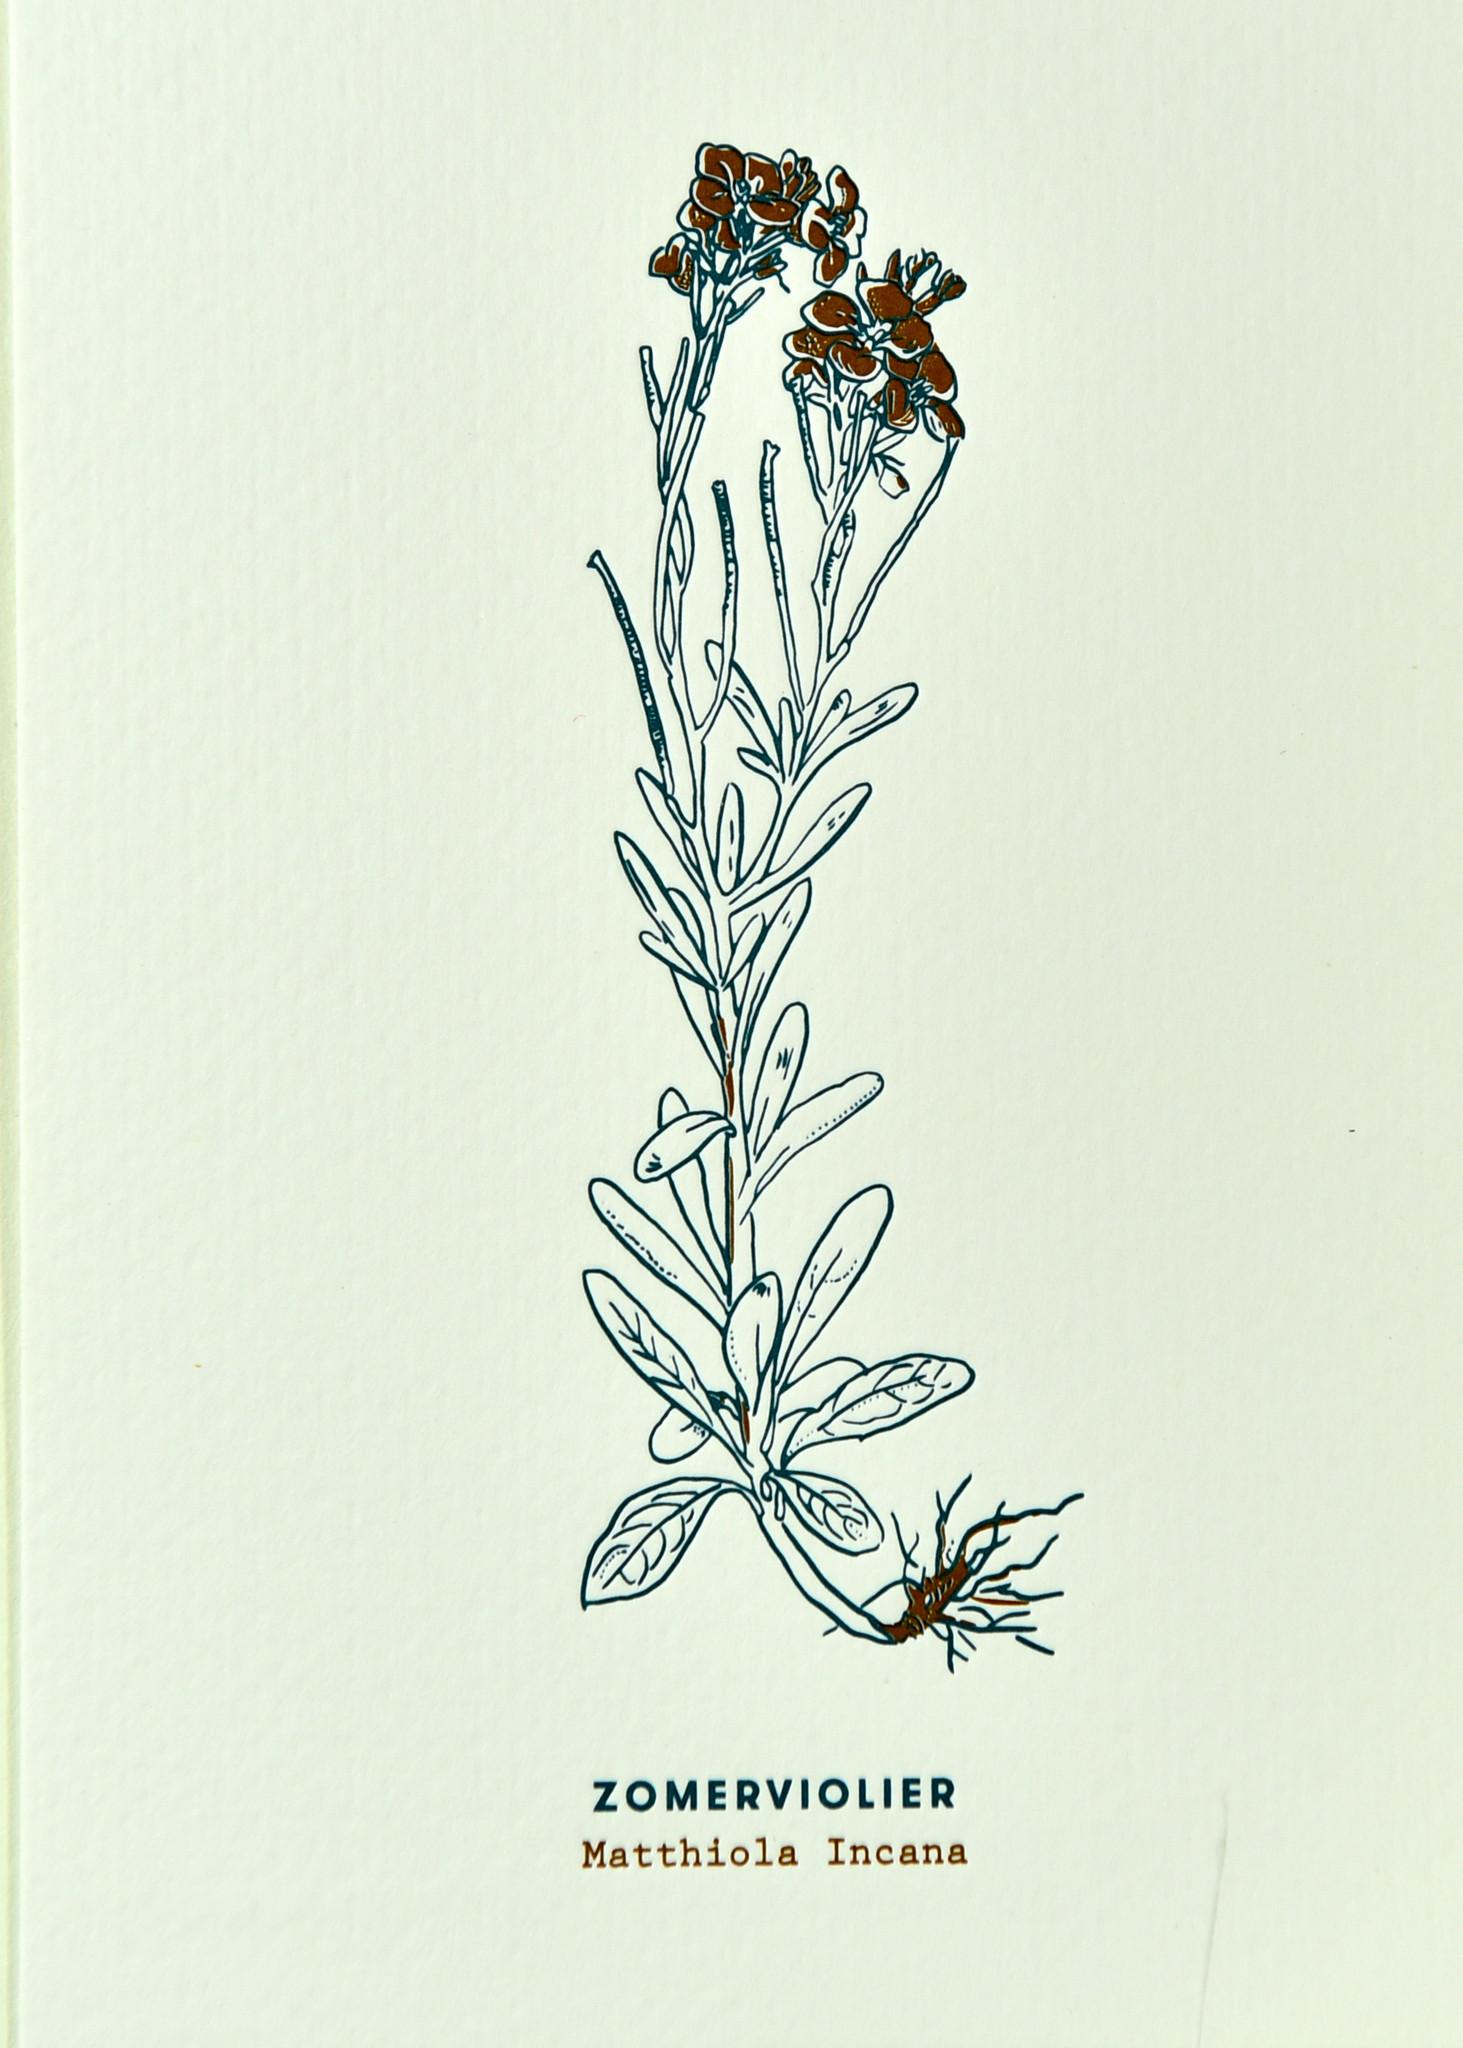 Blommm Luxe postkaart Zomerviolier - Blommm